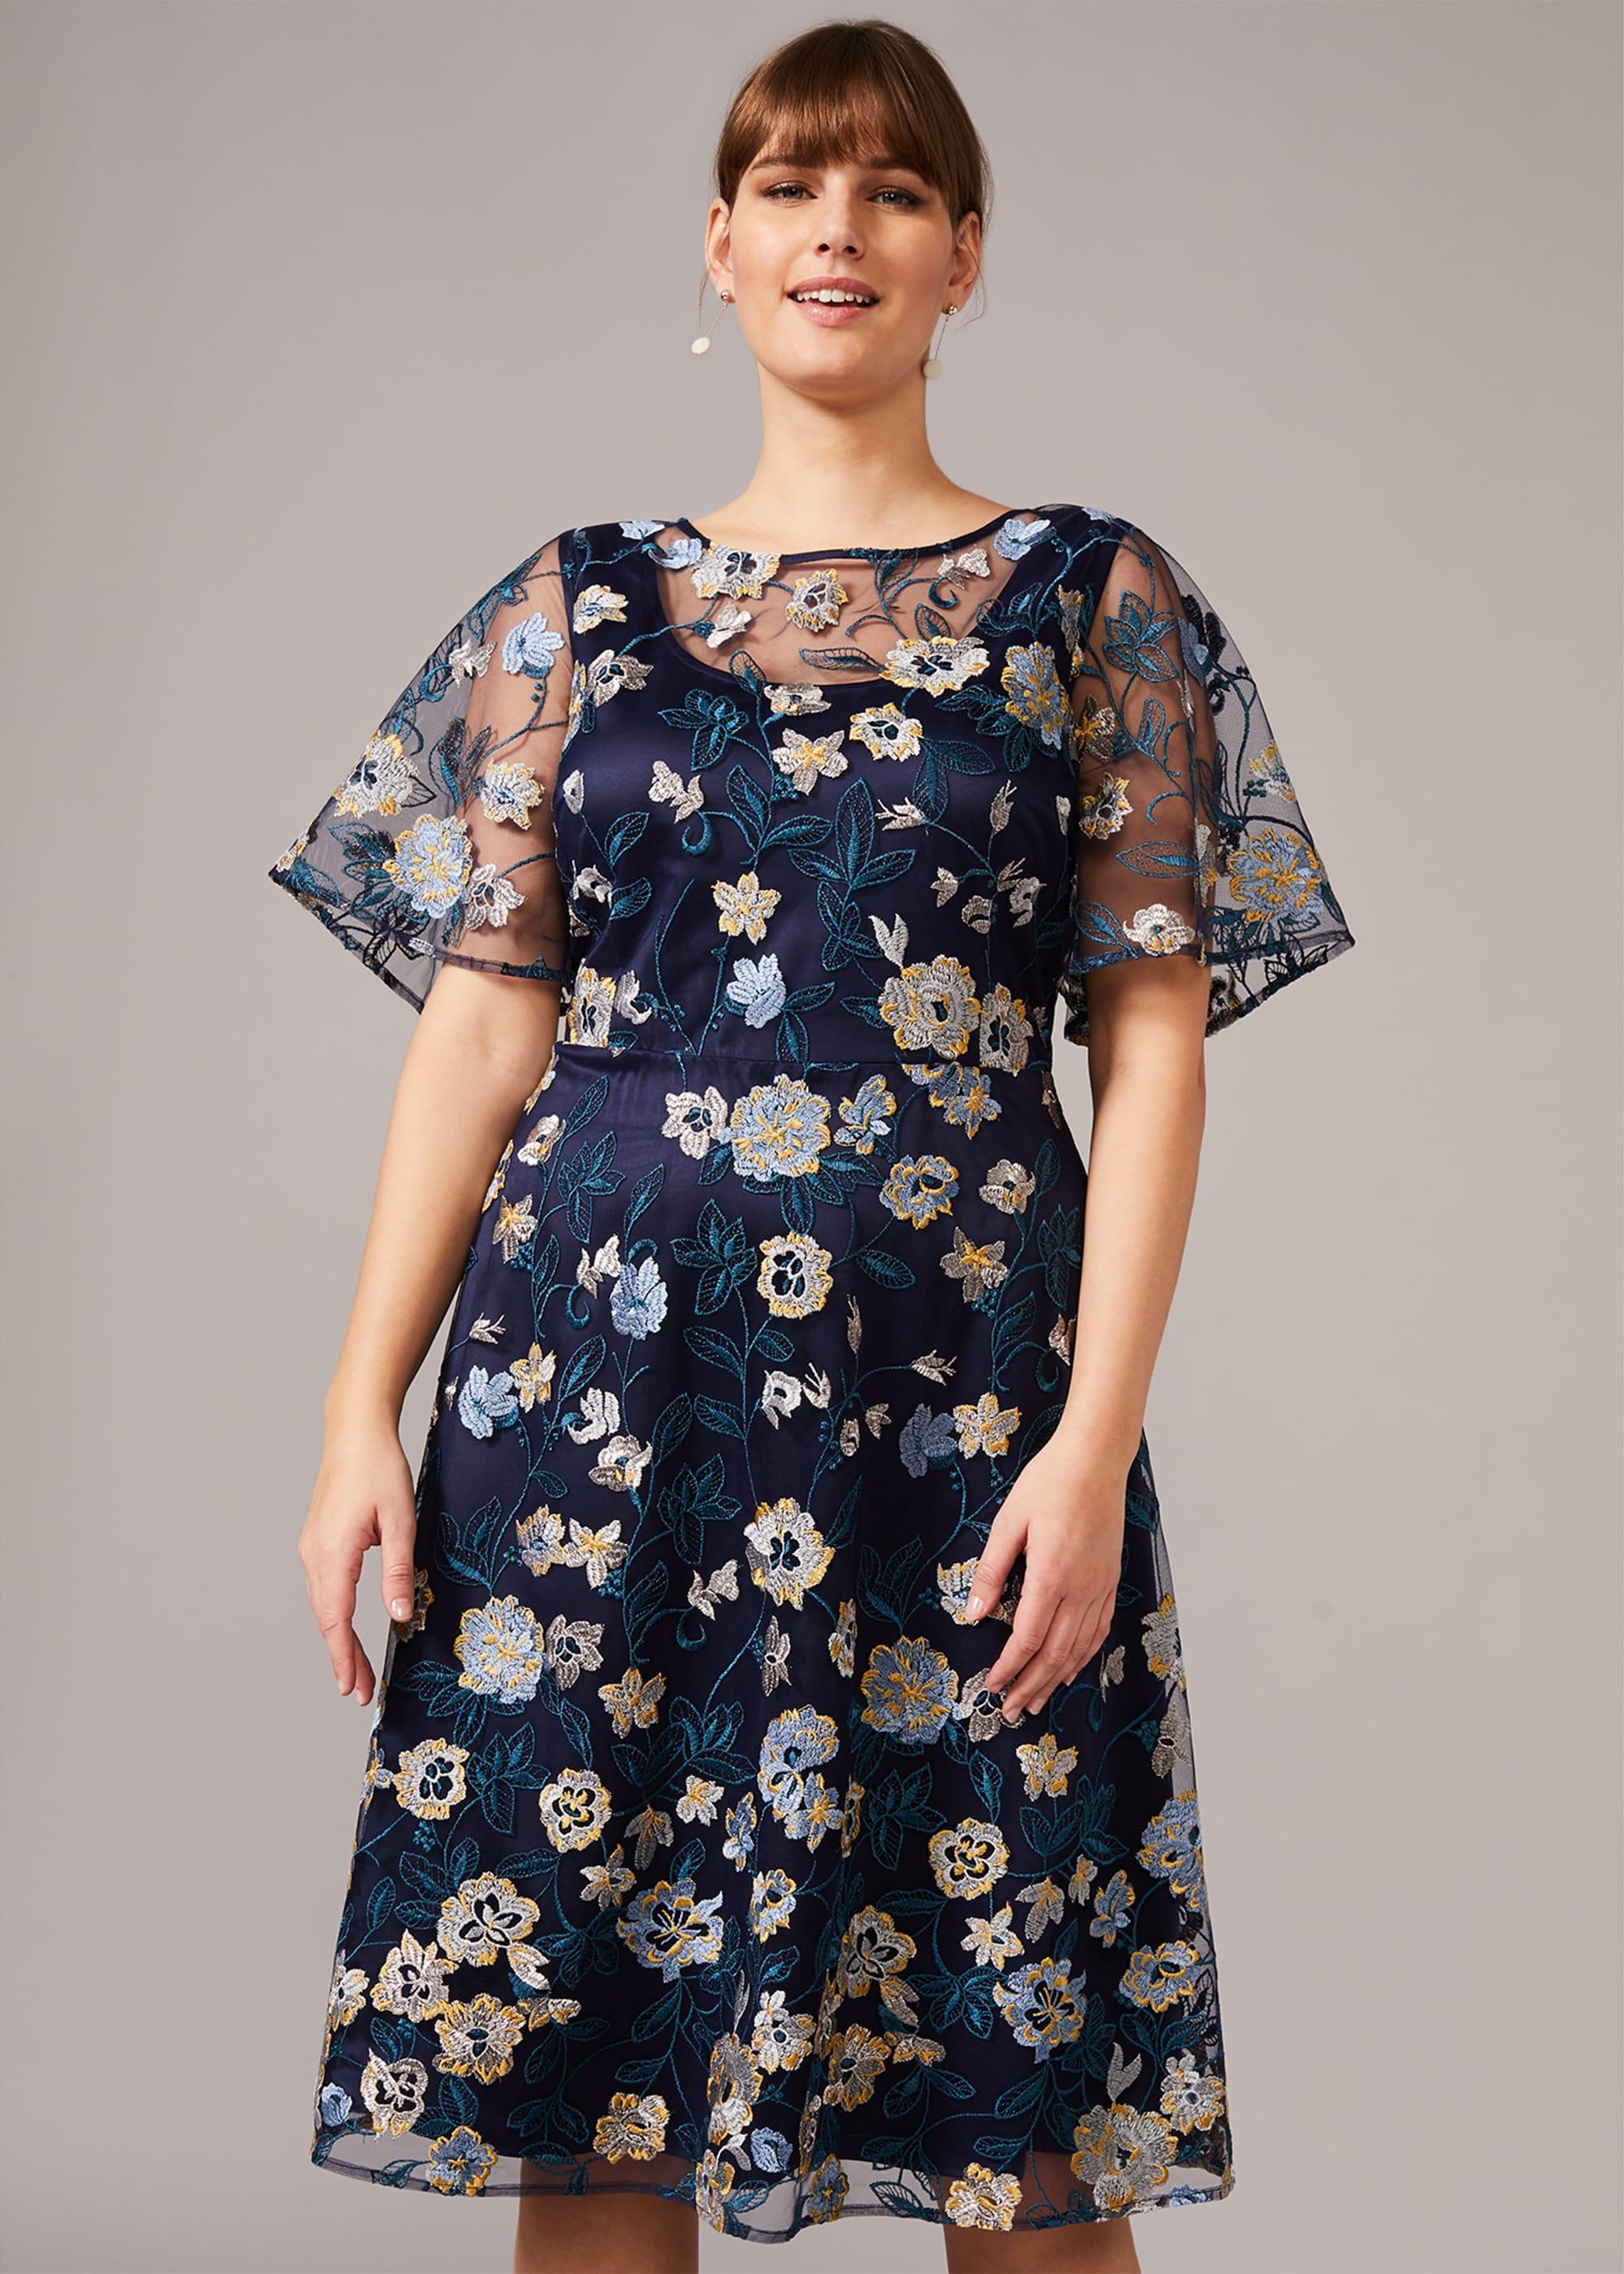 Studio 8 Women Steff Floral Embroidered Dress